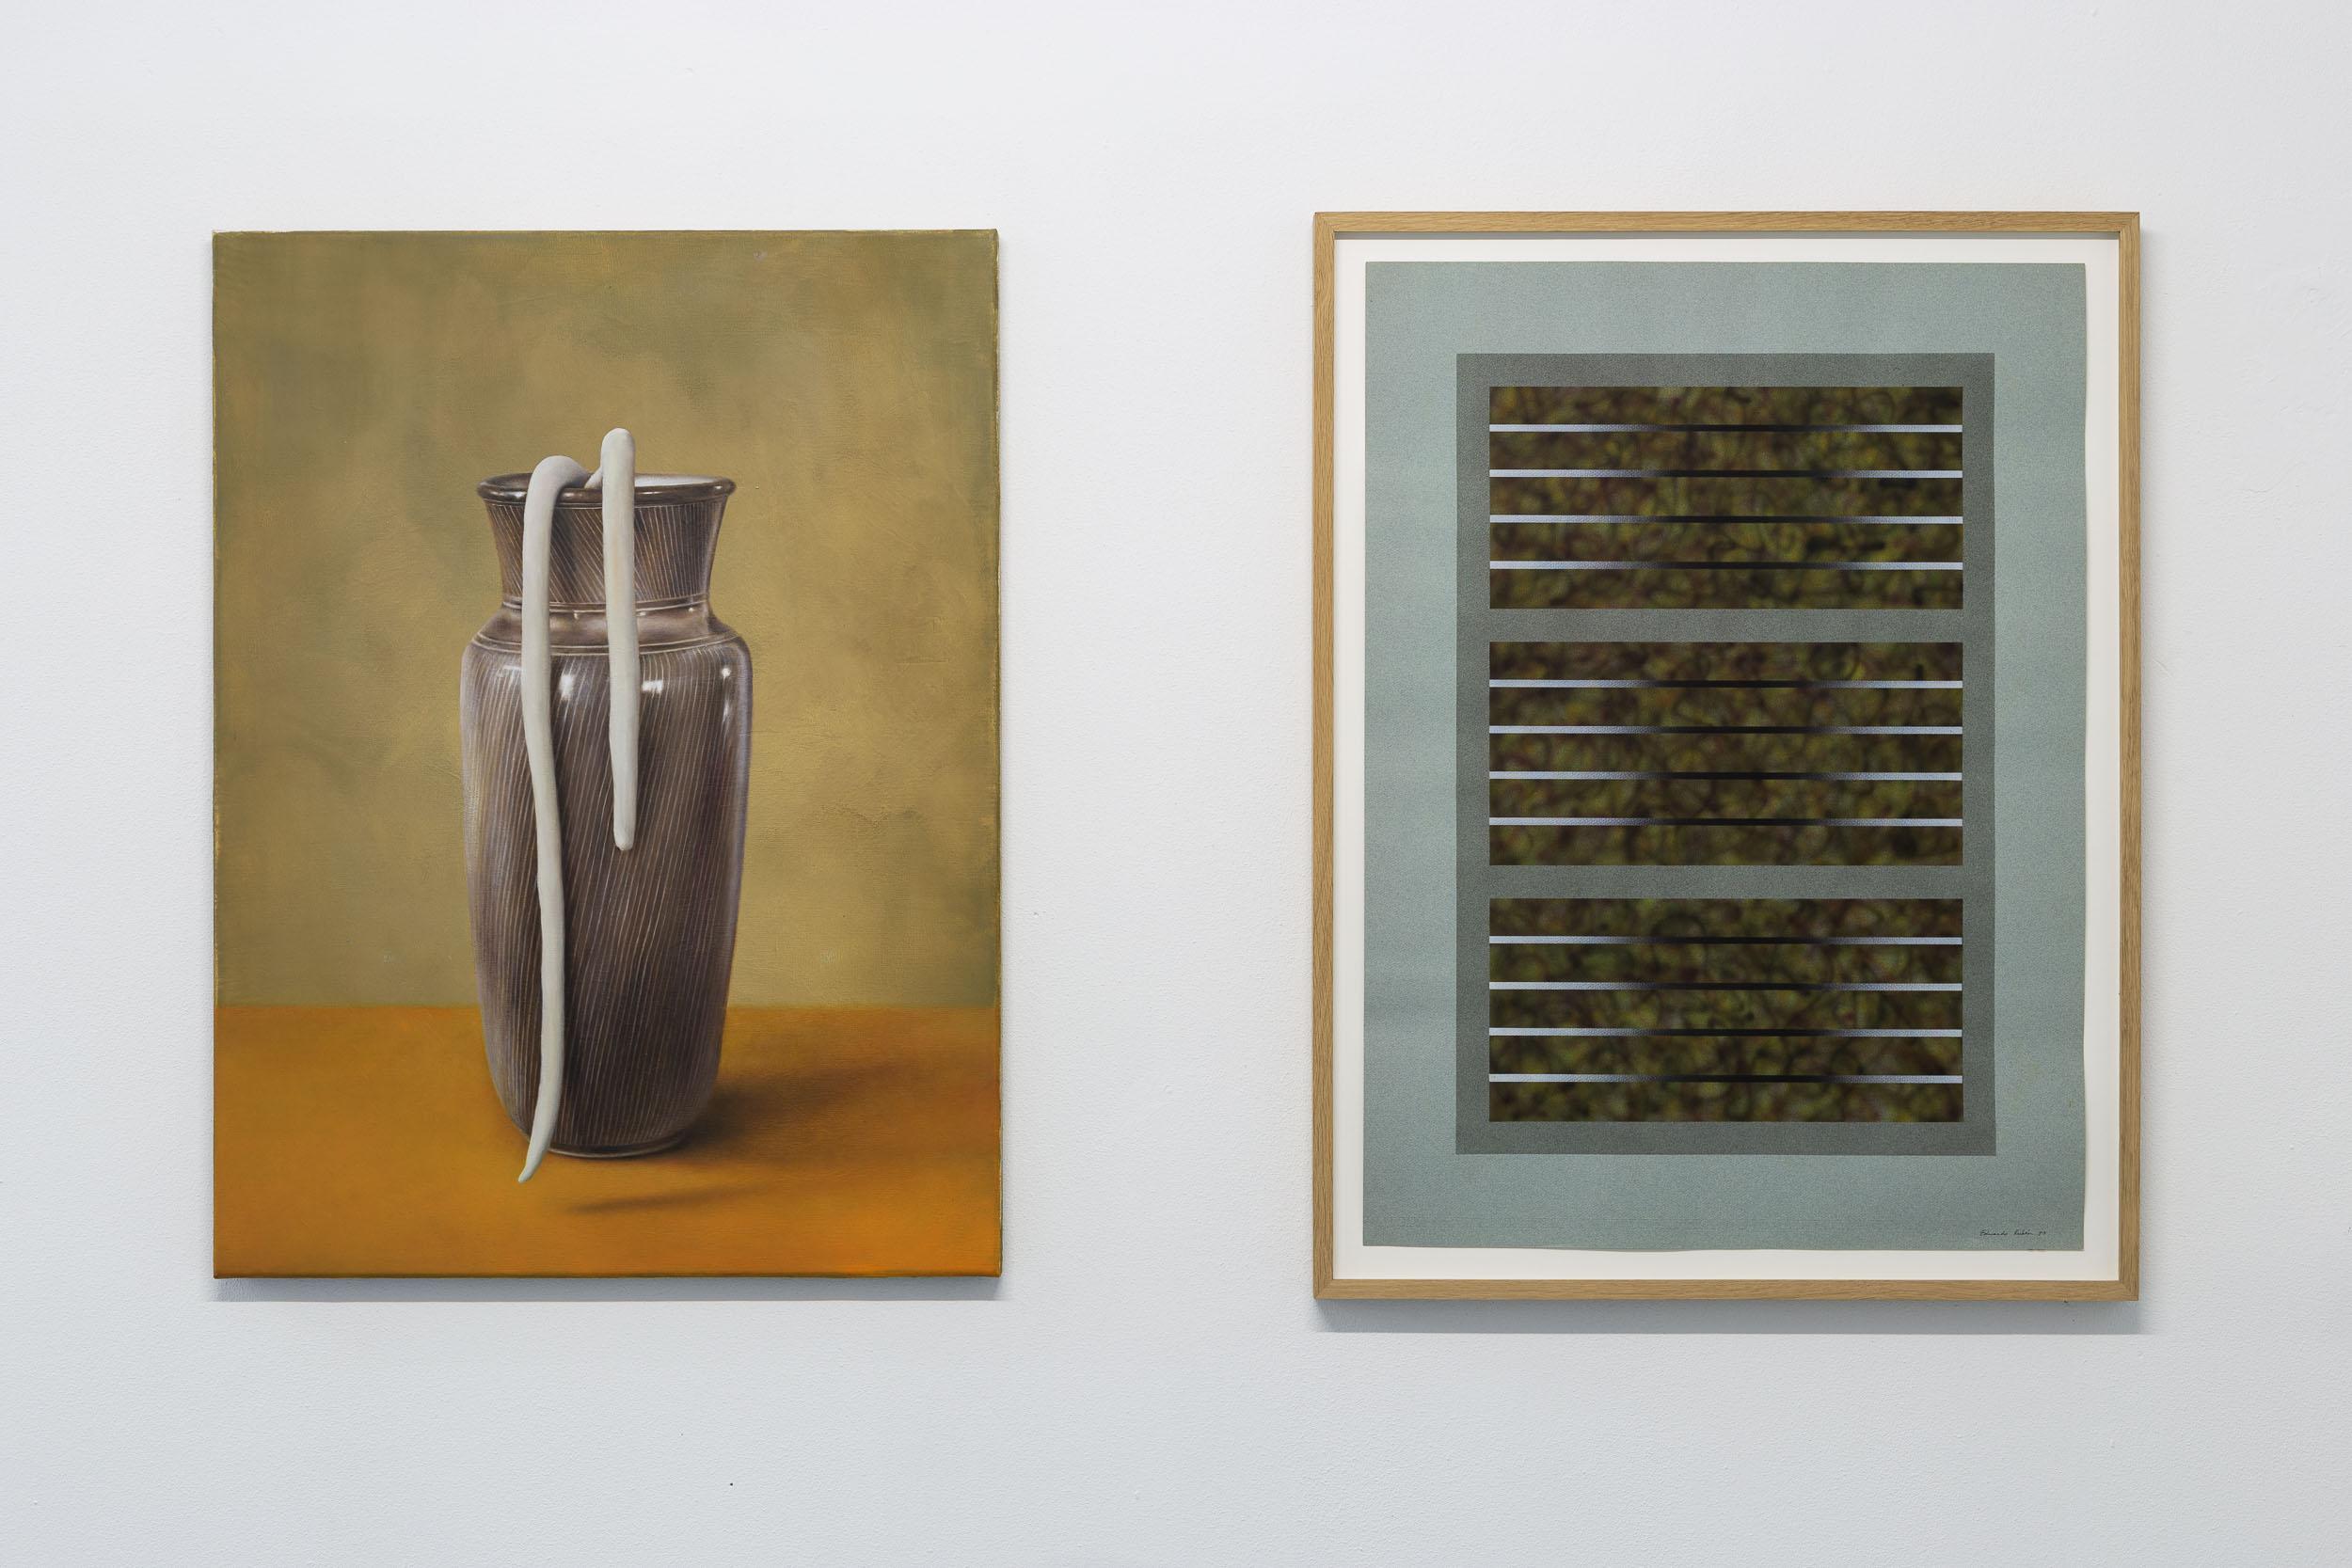 Left: Francisco Sierra,  Untitled , 2019, oil on canvas, 80 x 60 cm  Right: Eduardo Rubén,  Untitled  (from Windows series), 1987, acrylic on paper, 75 x 55 cm  Photo: Kilian Bannwart